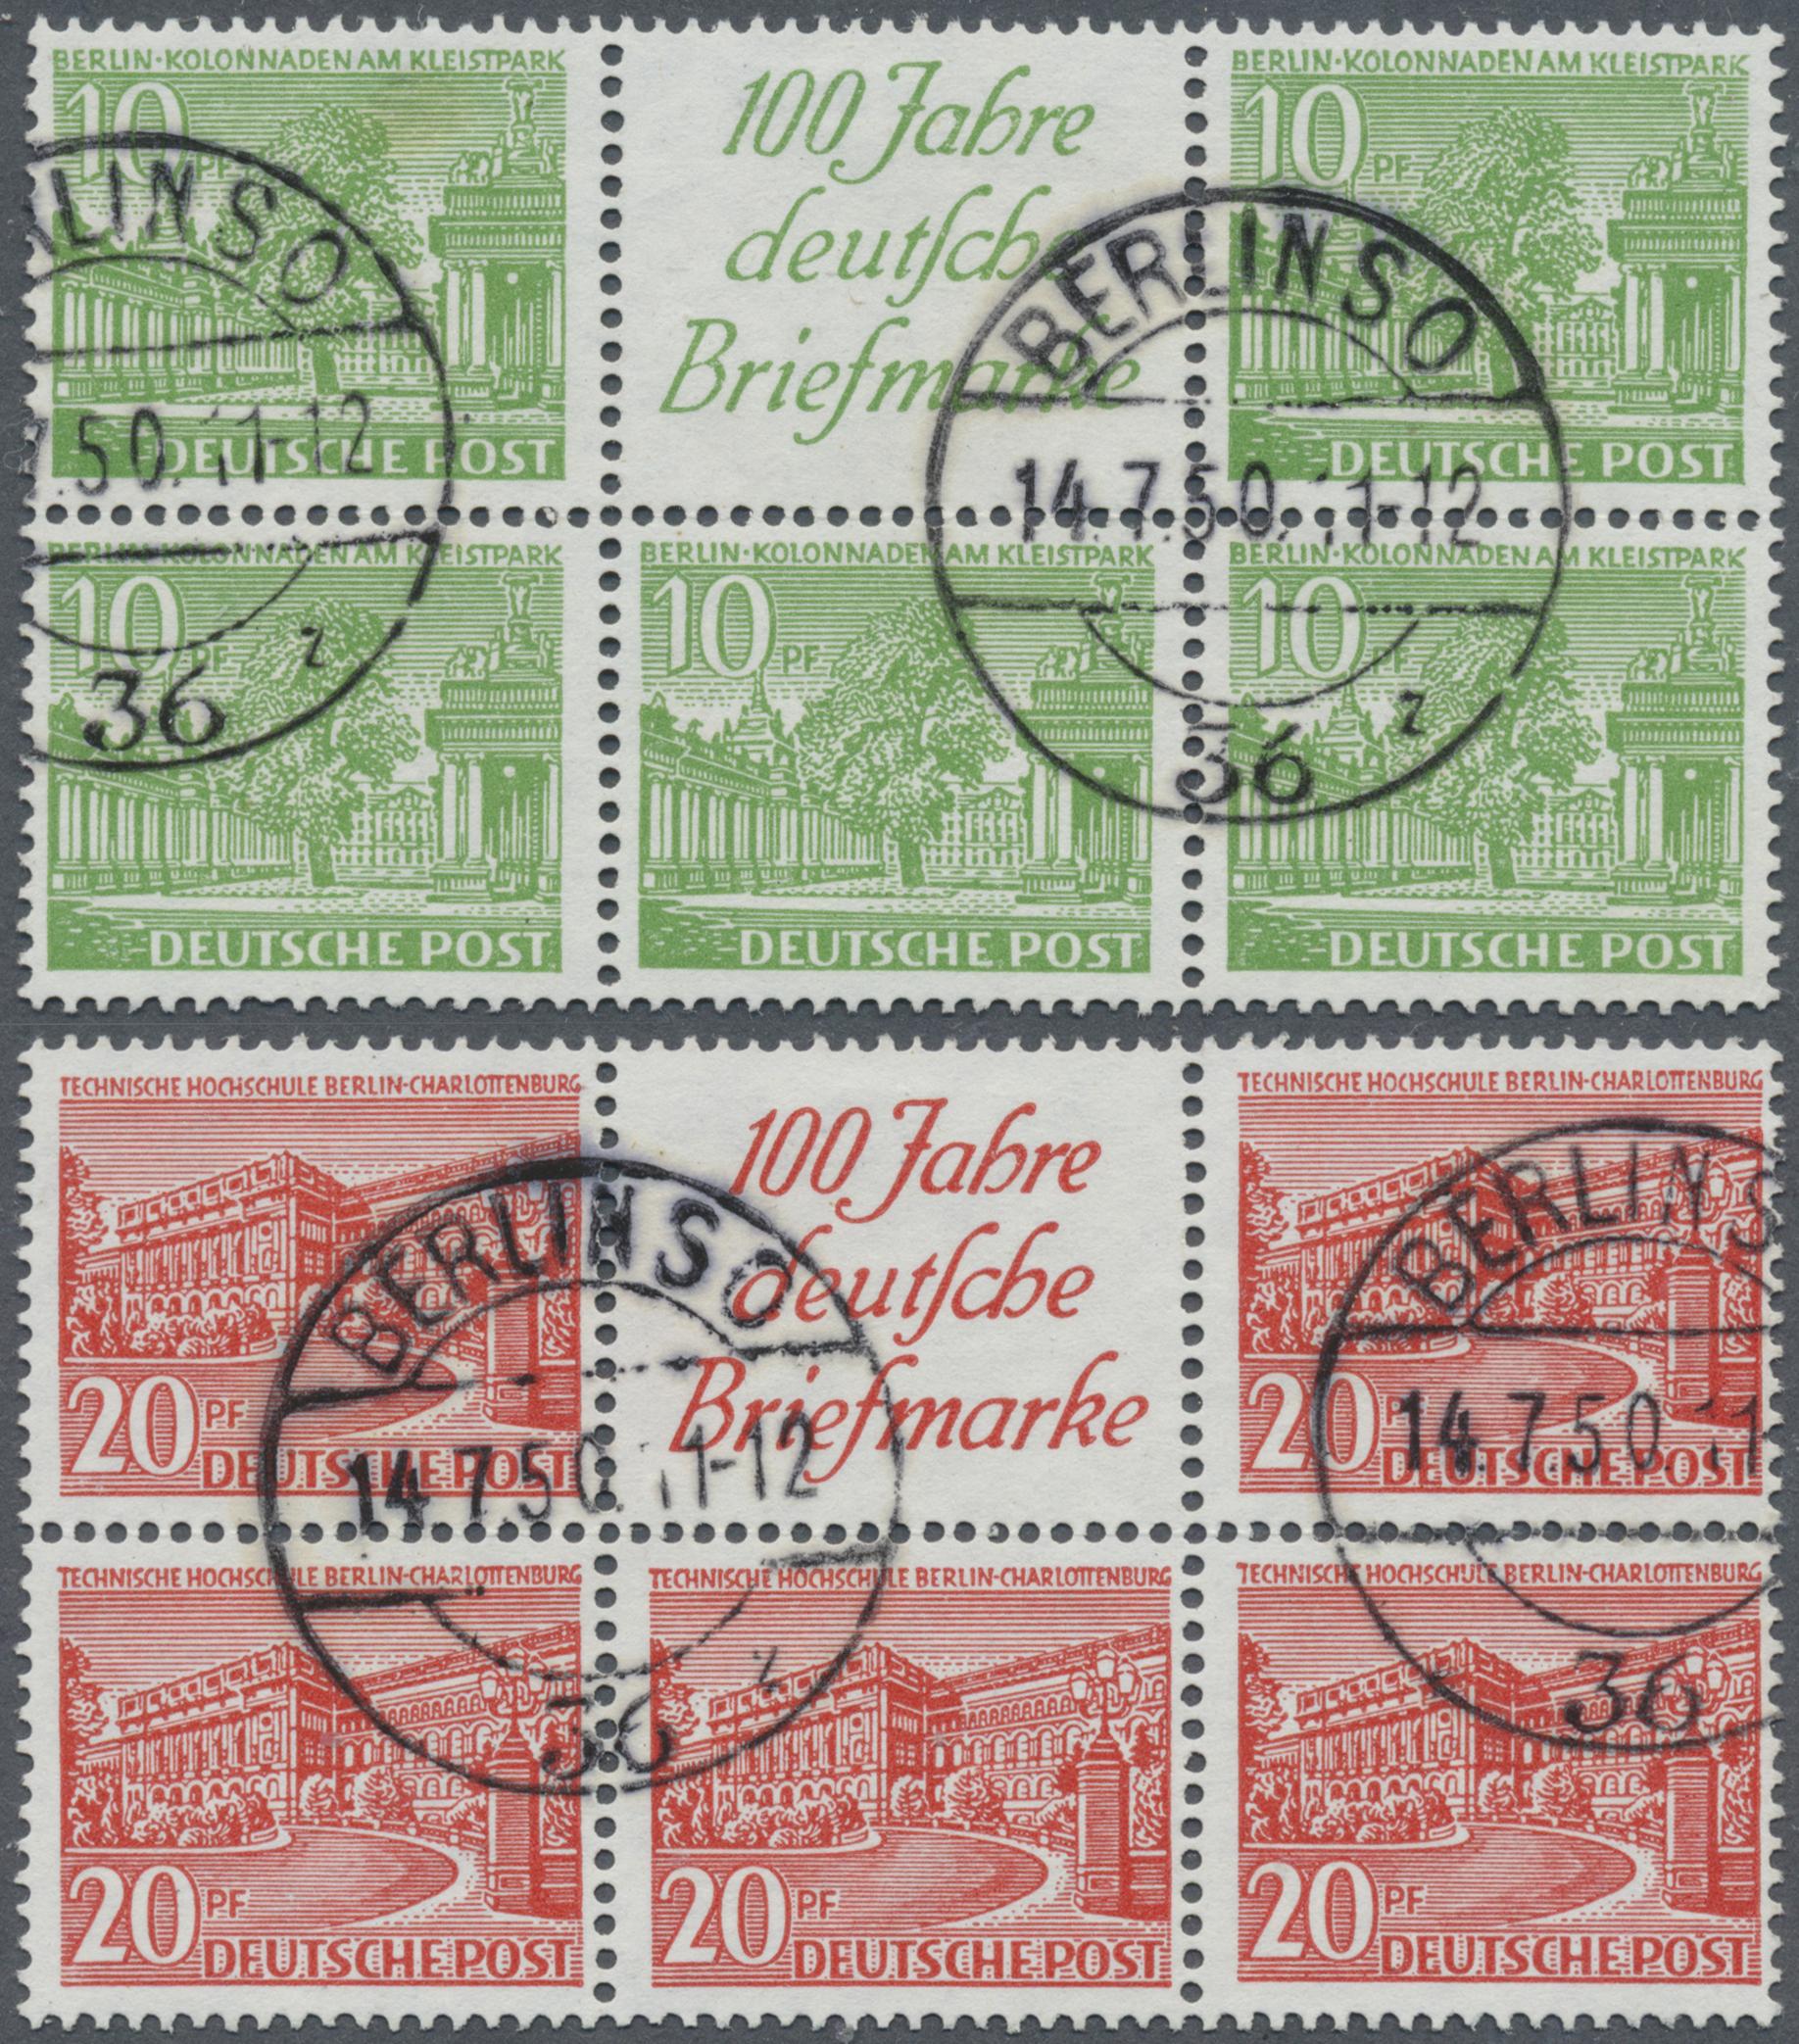 Lot 32541 - berlin - zusammendrucke  -  Auktionshaus Christoph Gärtner GmbH & Co. KG Auction #40 Collections Germany, Wunderkartons